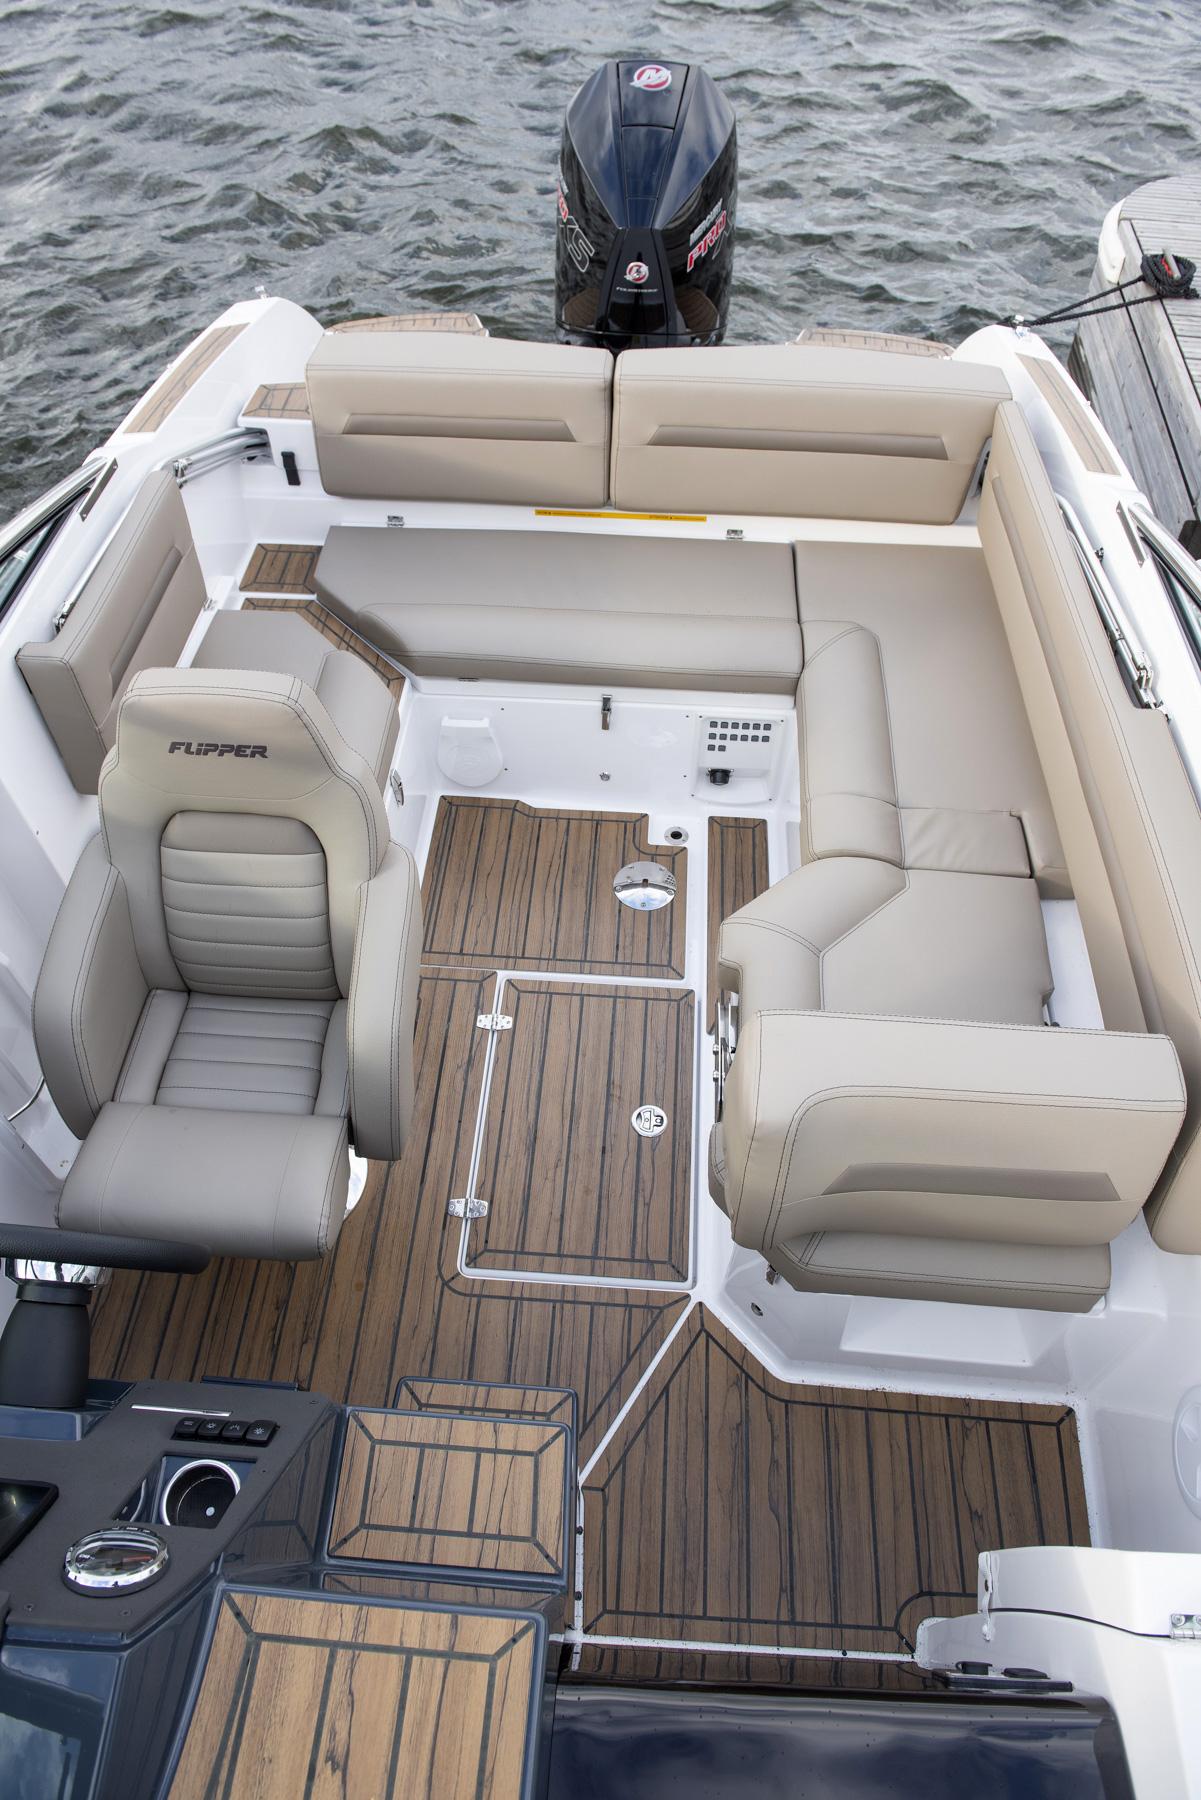 Flipper 650 Day Cruiser aft cockpit overhead